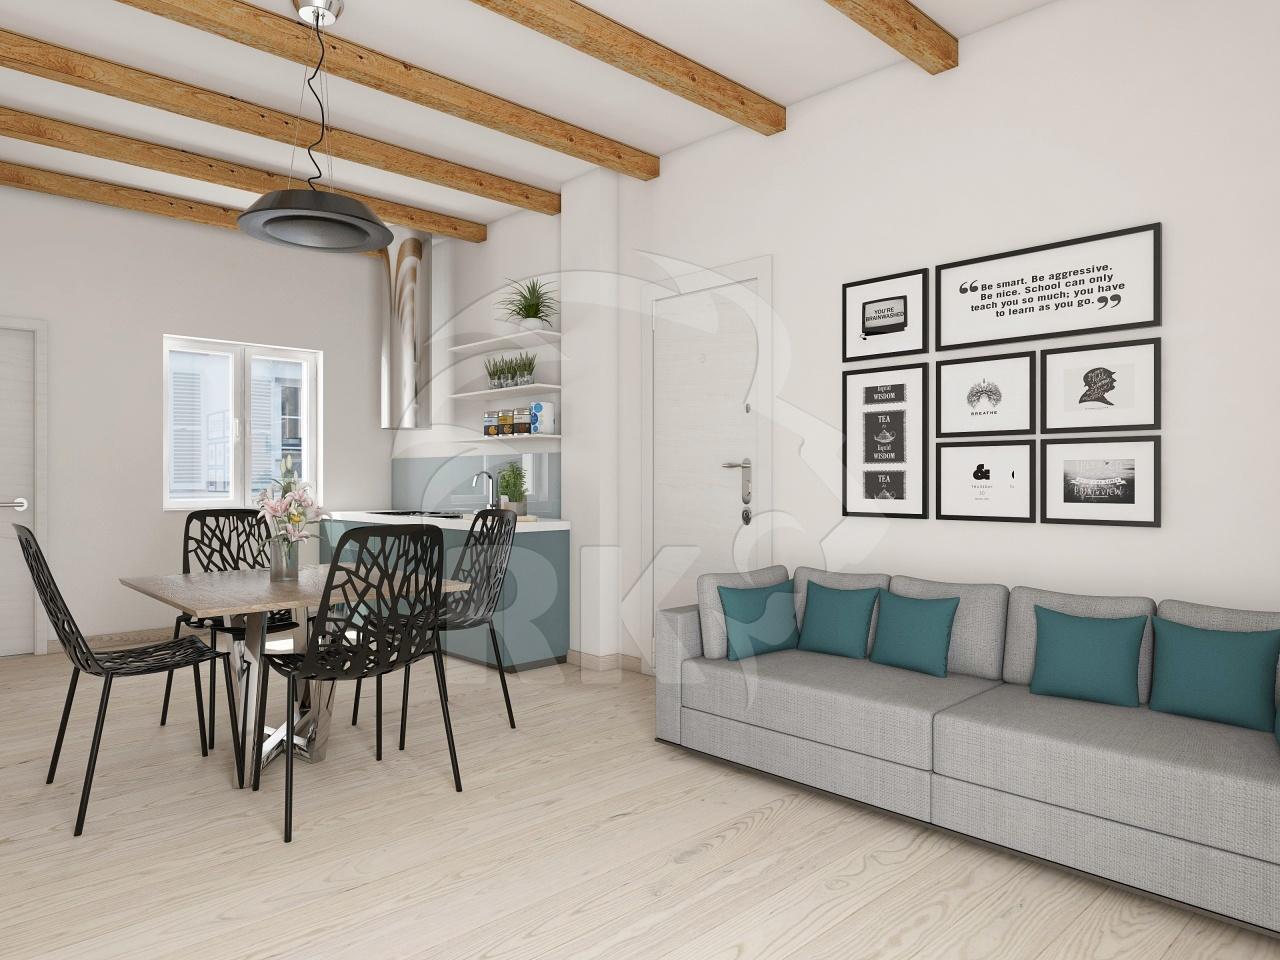 bologna vendita quart: galvani realkasa - agenzia immobiliare